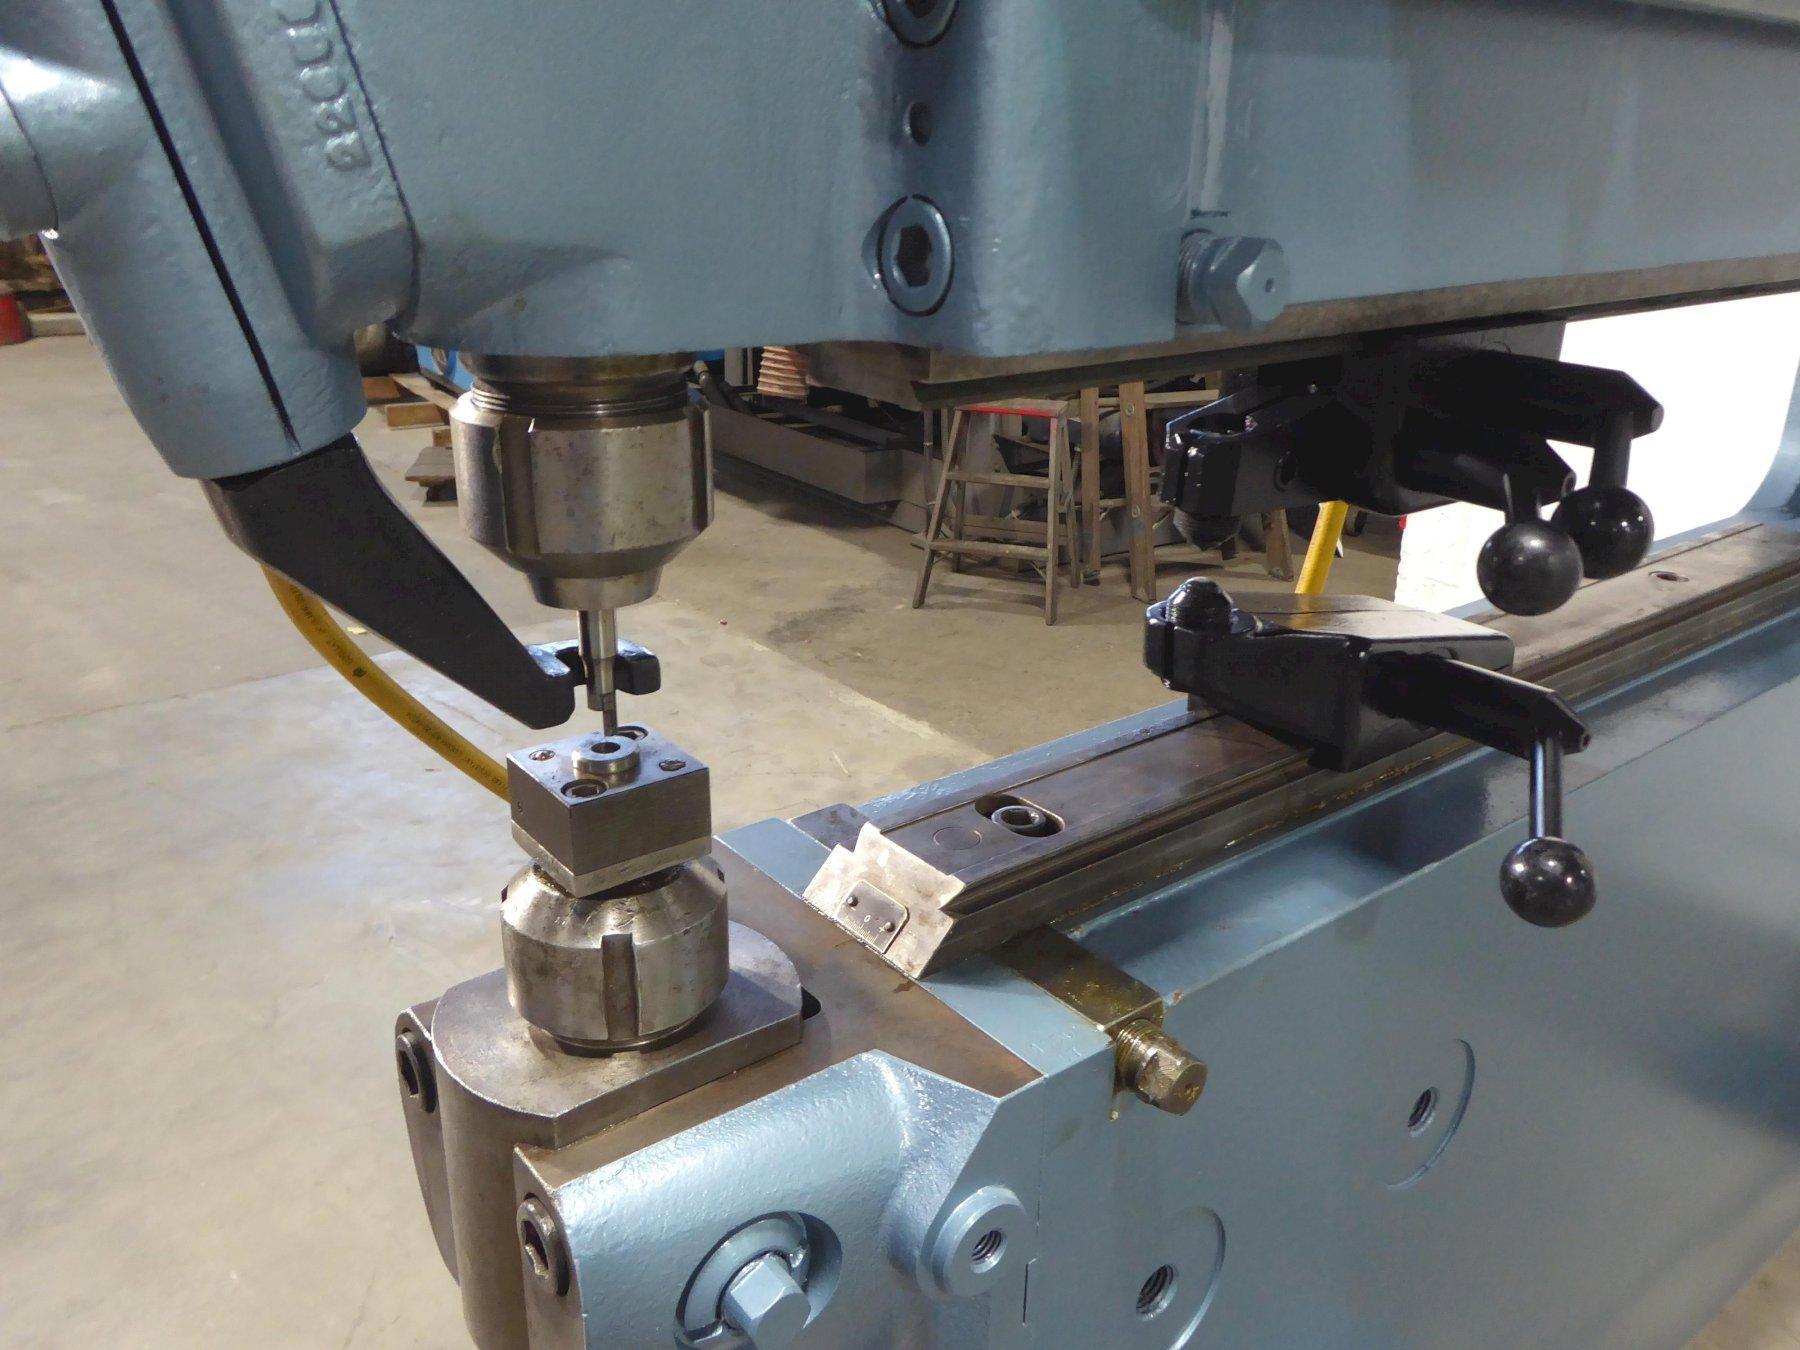 "PULLMAX No. P-9 Universal Shearing and Forming Machine, 3/8"" Edge Cutting Capacity, 48"" Throat, 5 HP, Clean"